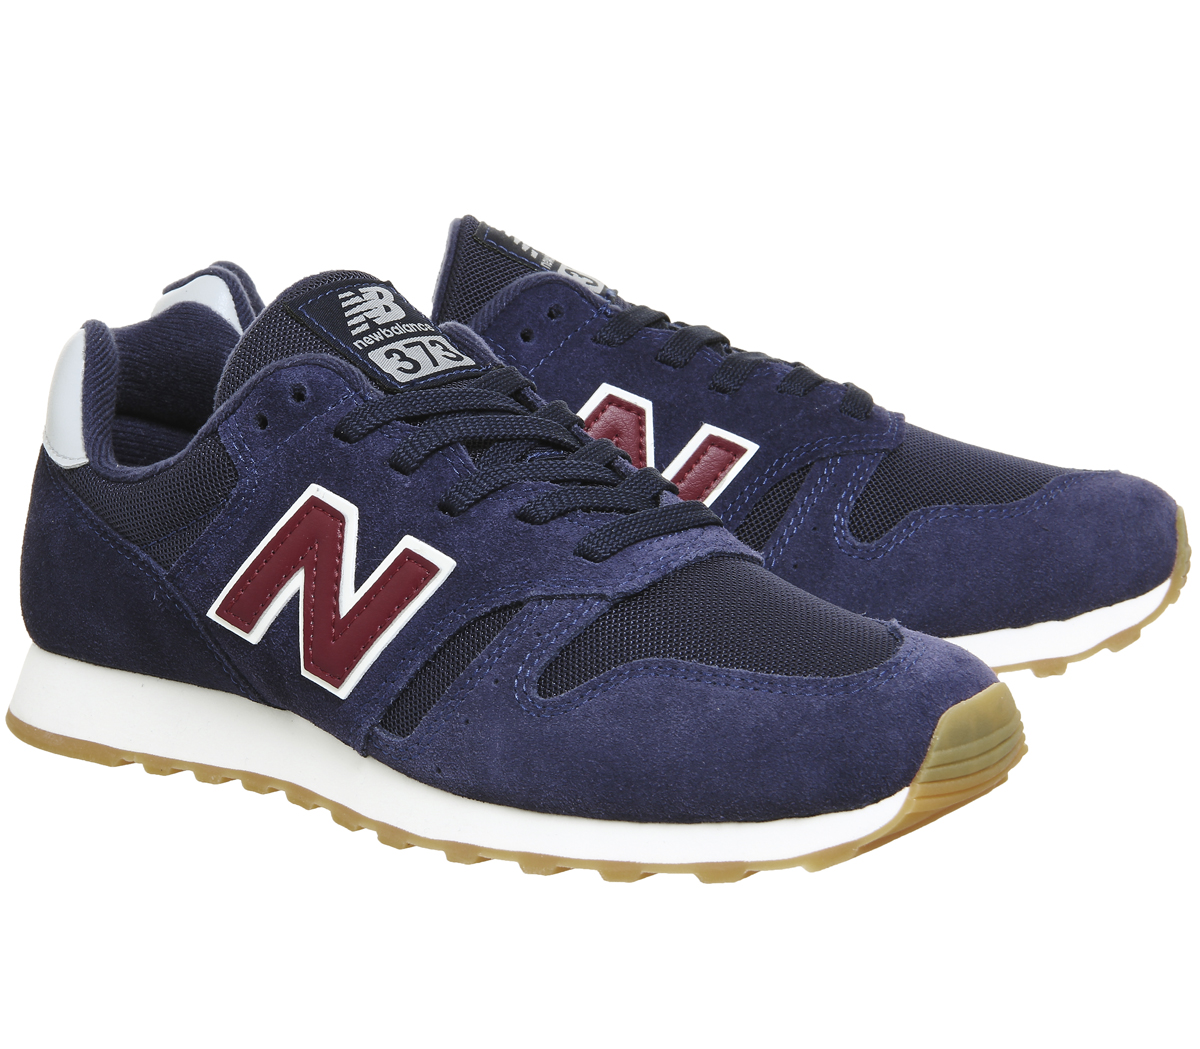 36600854312 Para mujer 373 Tenis Azul Marino Tenis New Balance Zapatos 50f5a3 ...